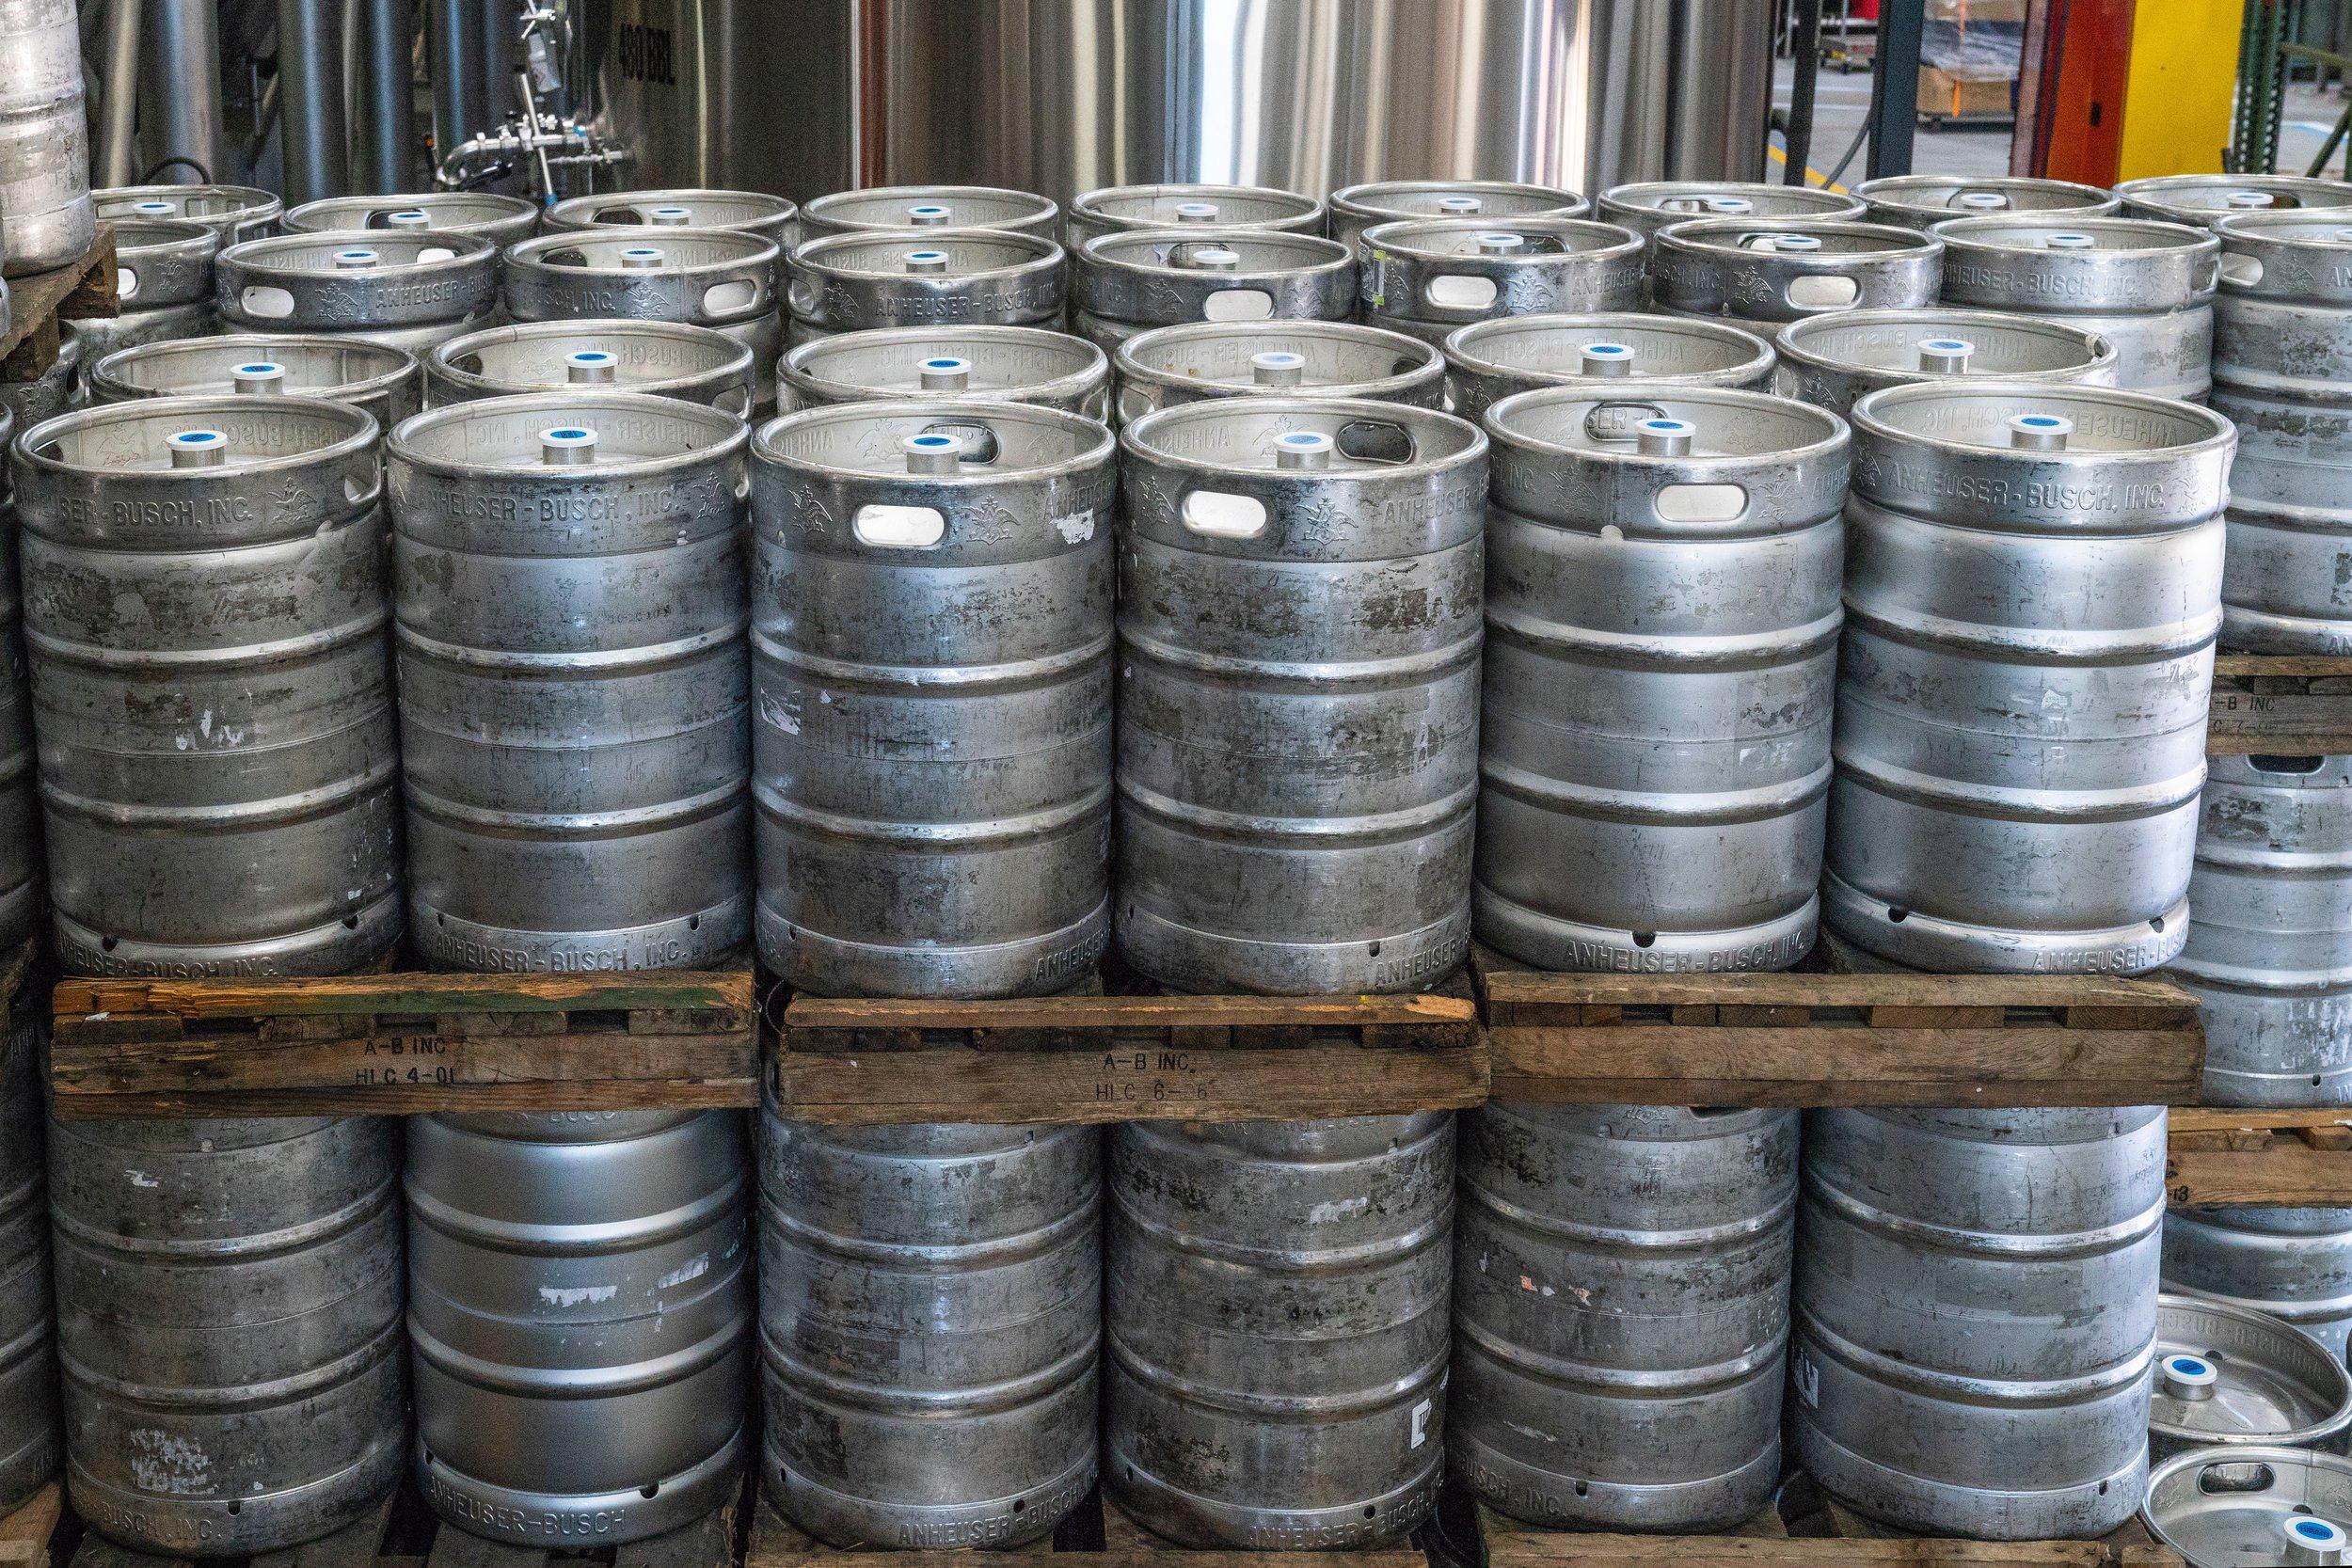 alcohol-barrel-beer-1267328.jpg